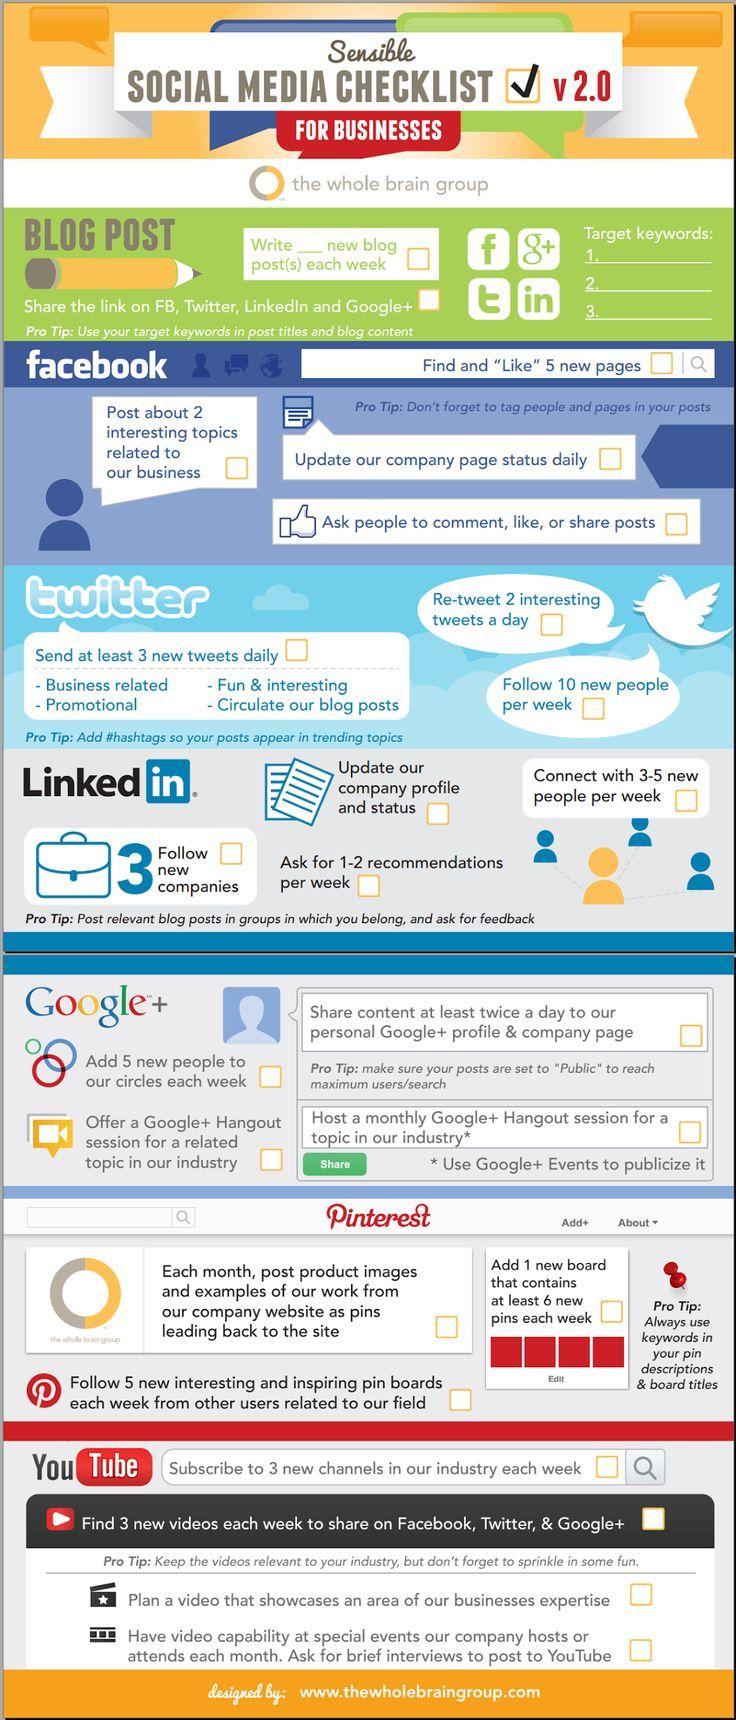 Sensible social media checklist for marketers - #infographic #socialmedia #socialmediamarketing #albertobokos